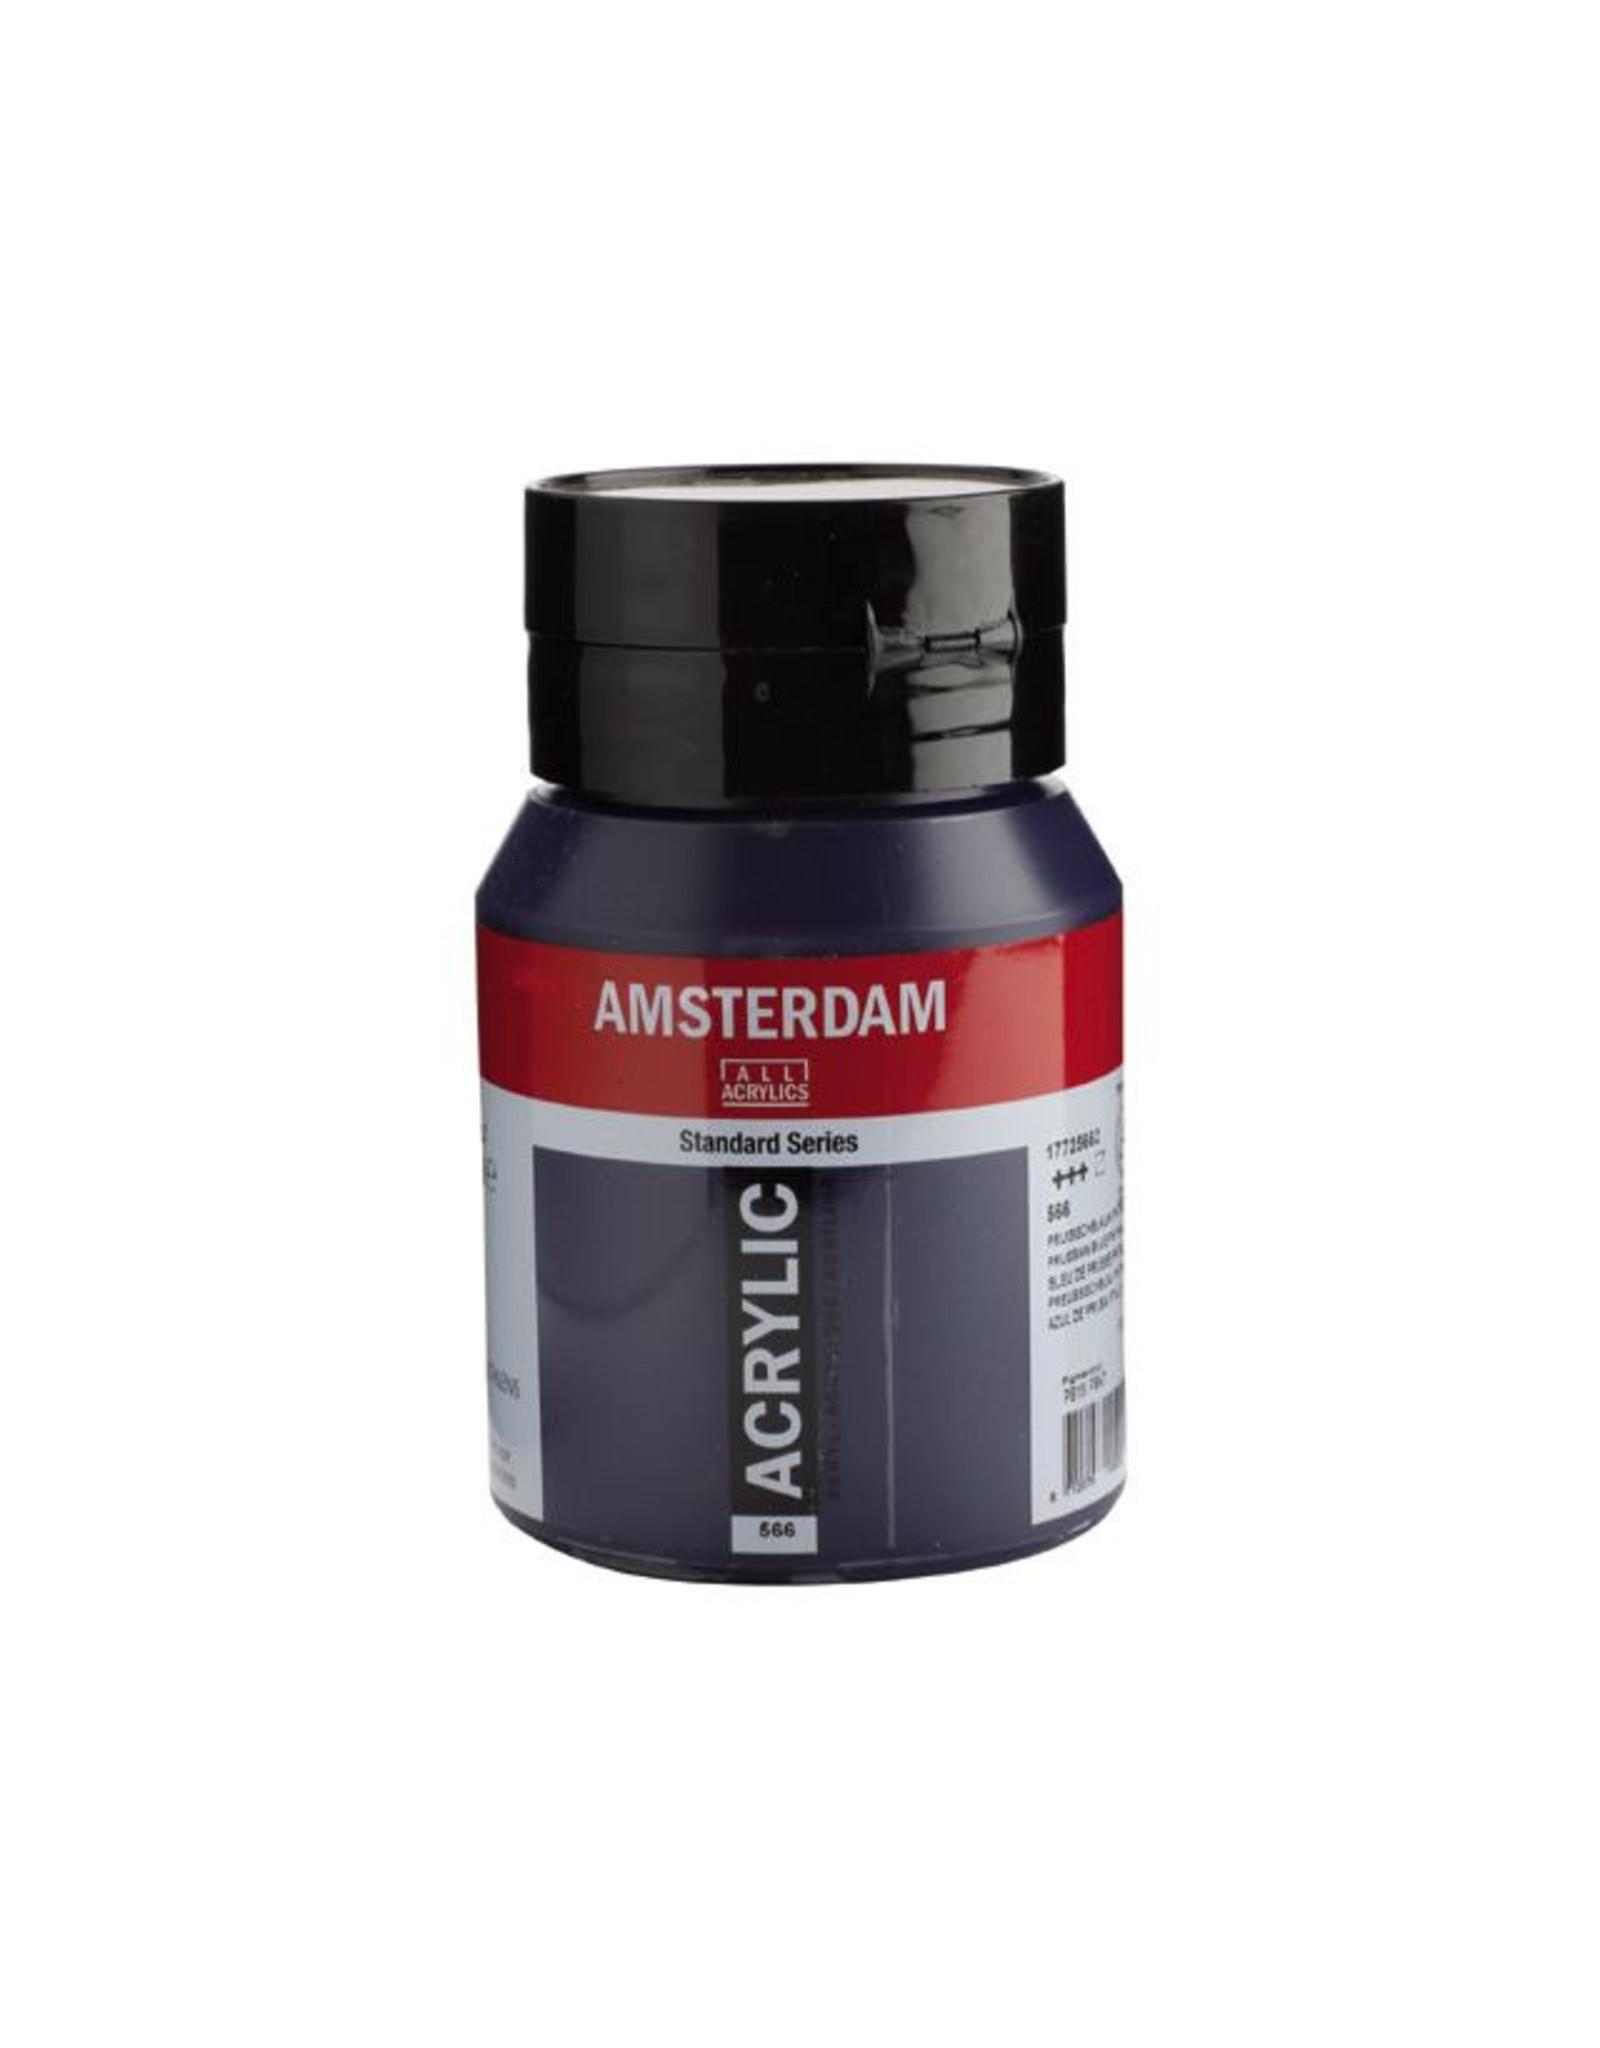 Talens Amsterdam acrylverf Pruisischblauw (phtalo) 500ML